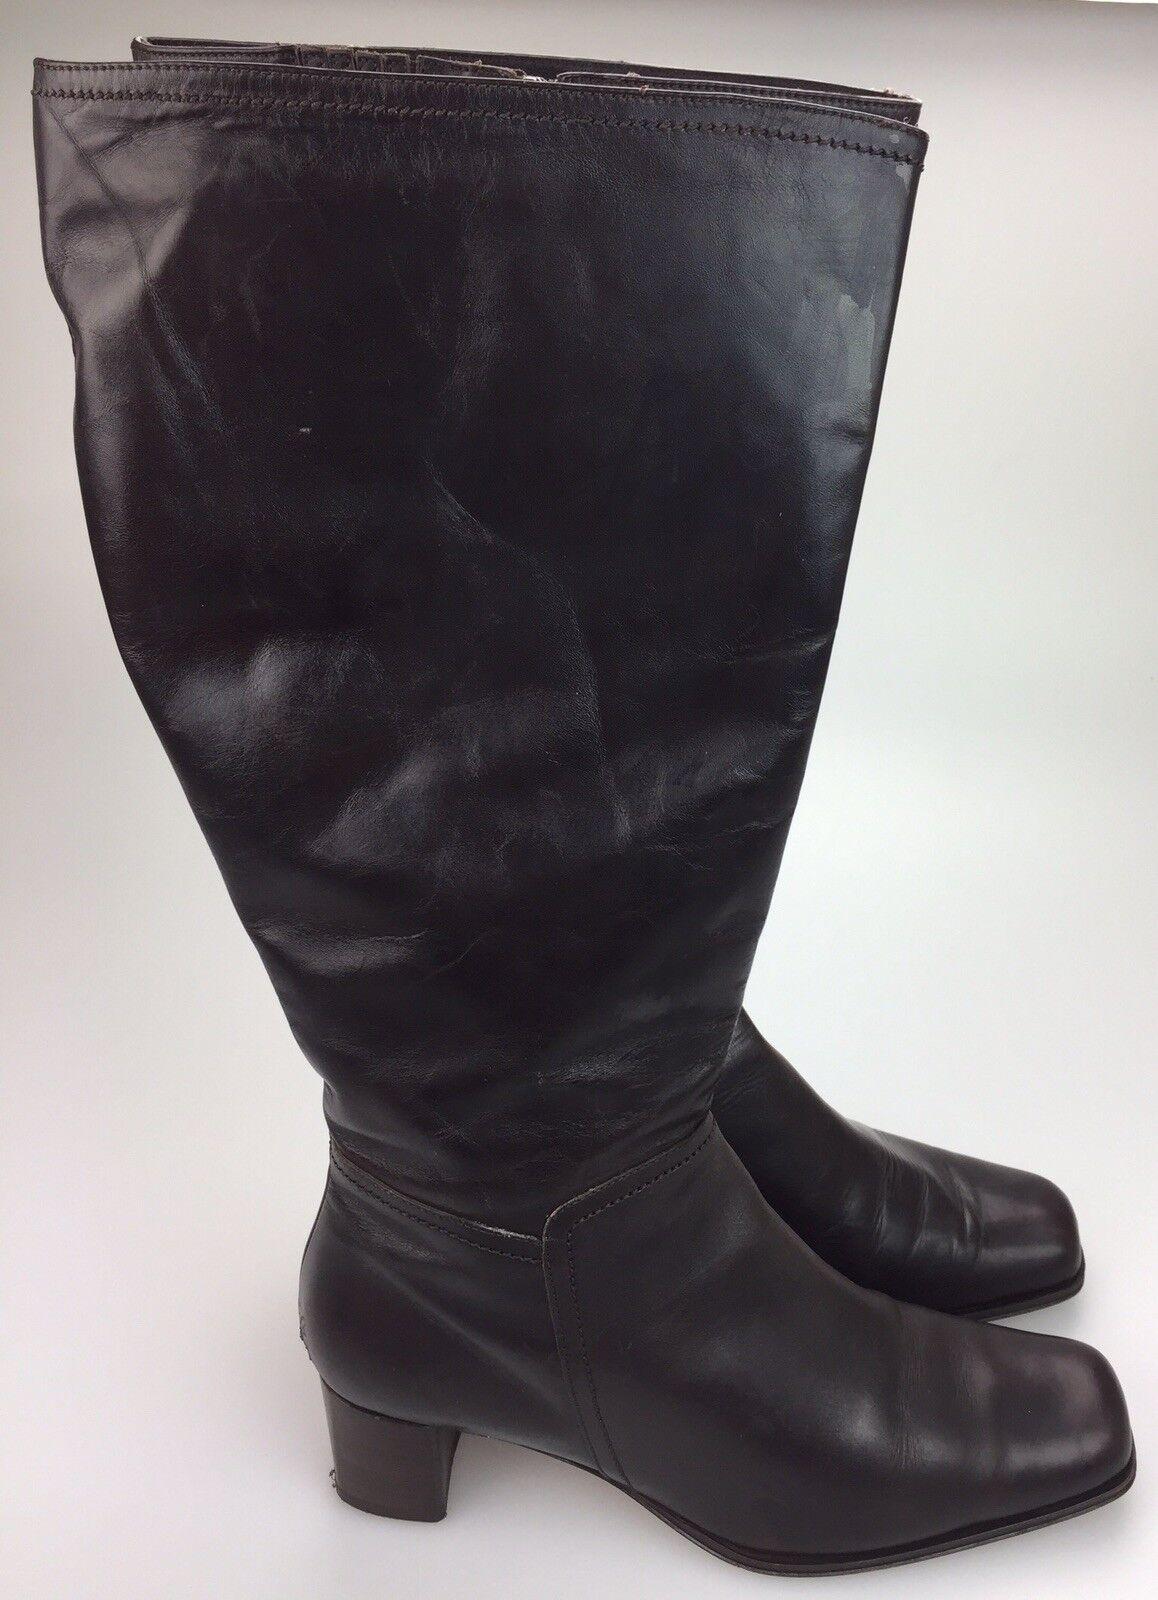 Eddie Bauer Riding Boots Women's 11 M Made  Soft Brown Leather Zip Knee